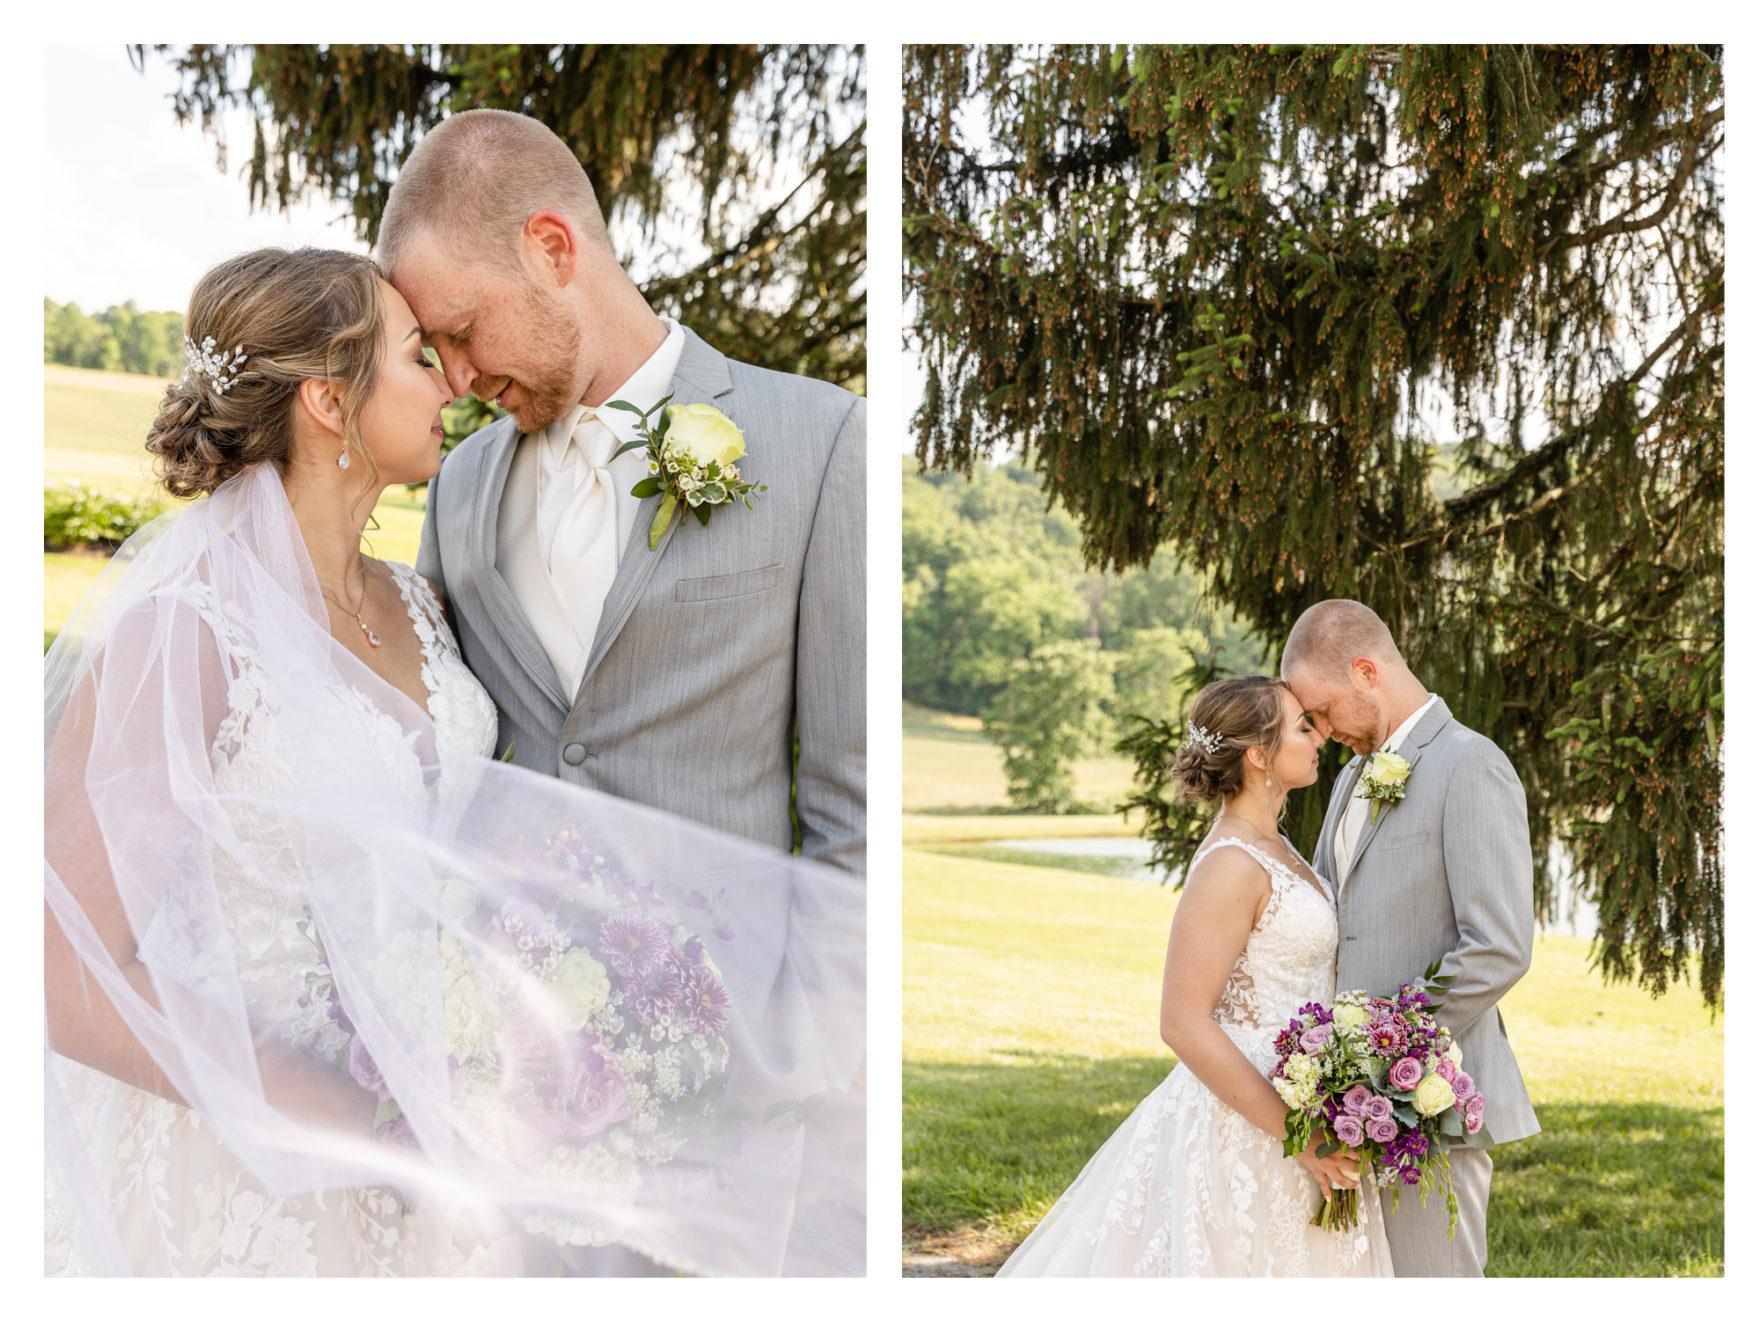 Summer Wedding Stone Ridge Hollow June Wedding Lavender dresses bride and groom newlyweds